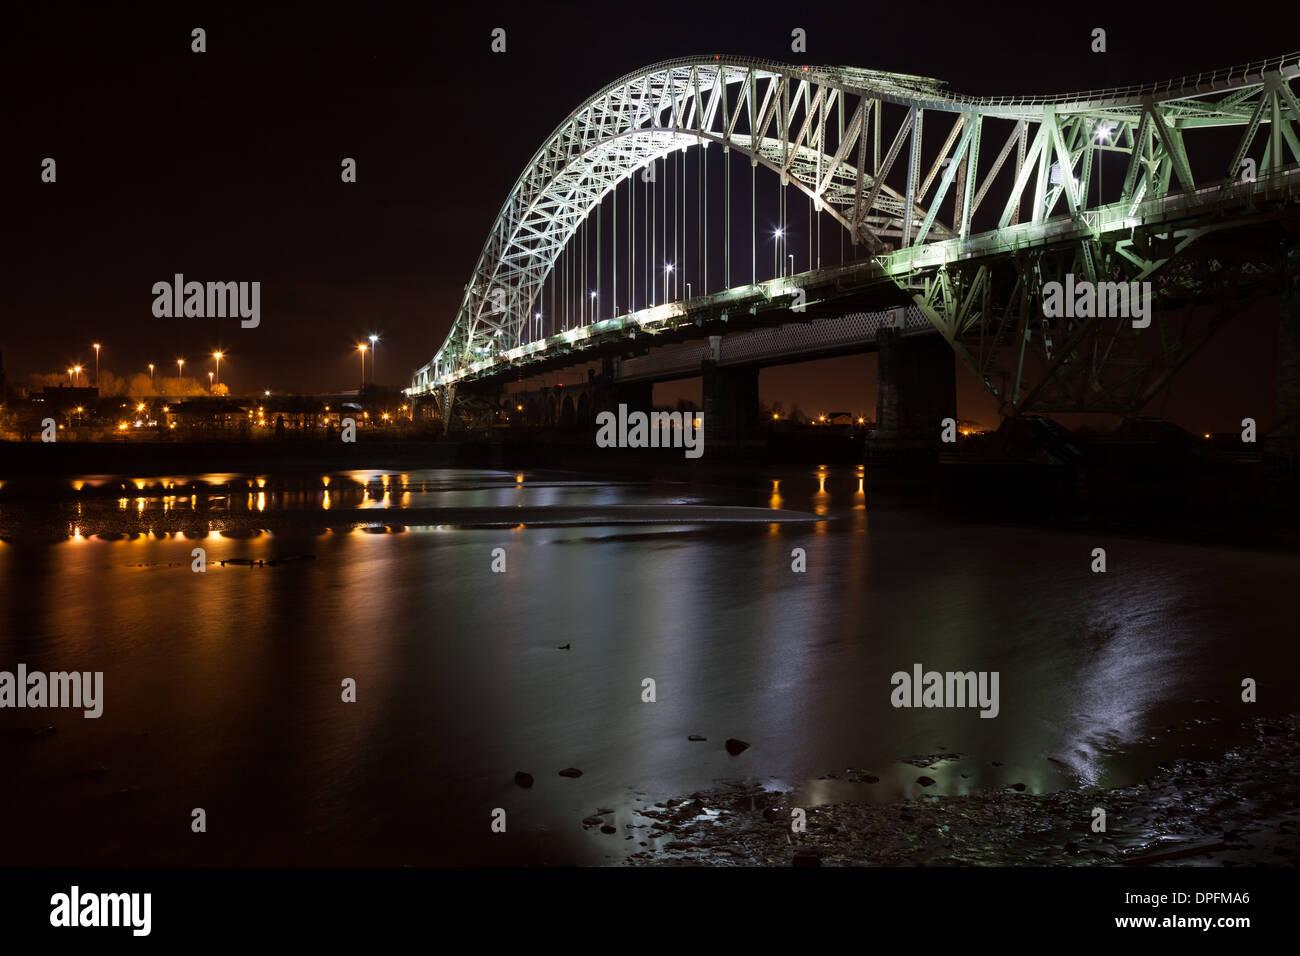 The Silver Jubilee Bridge, also known as the Runcorn Bridge in Cheshire illuminated at night. - Stock Image